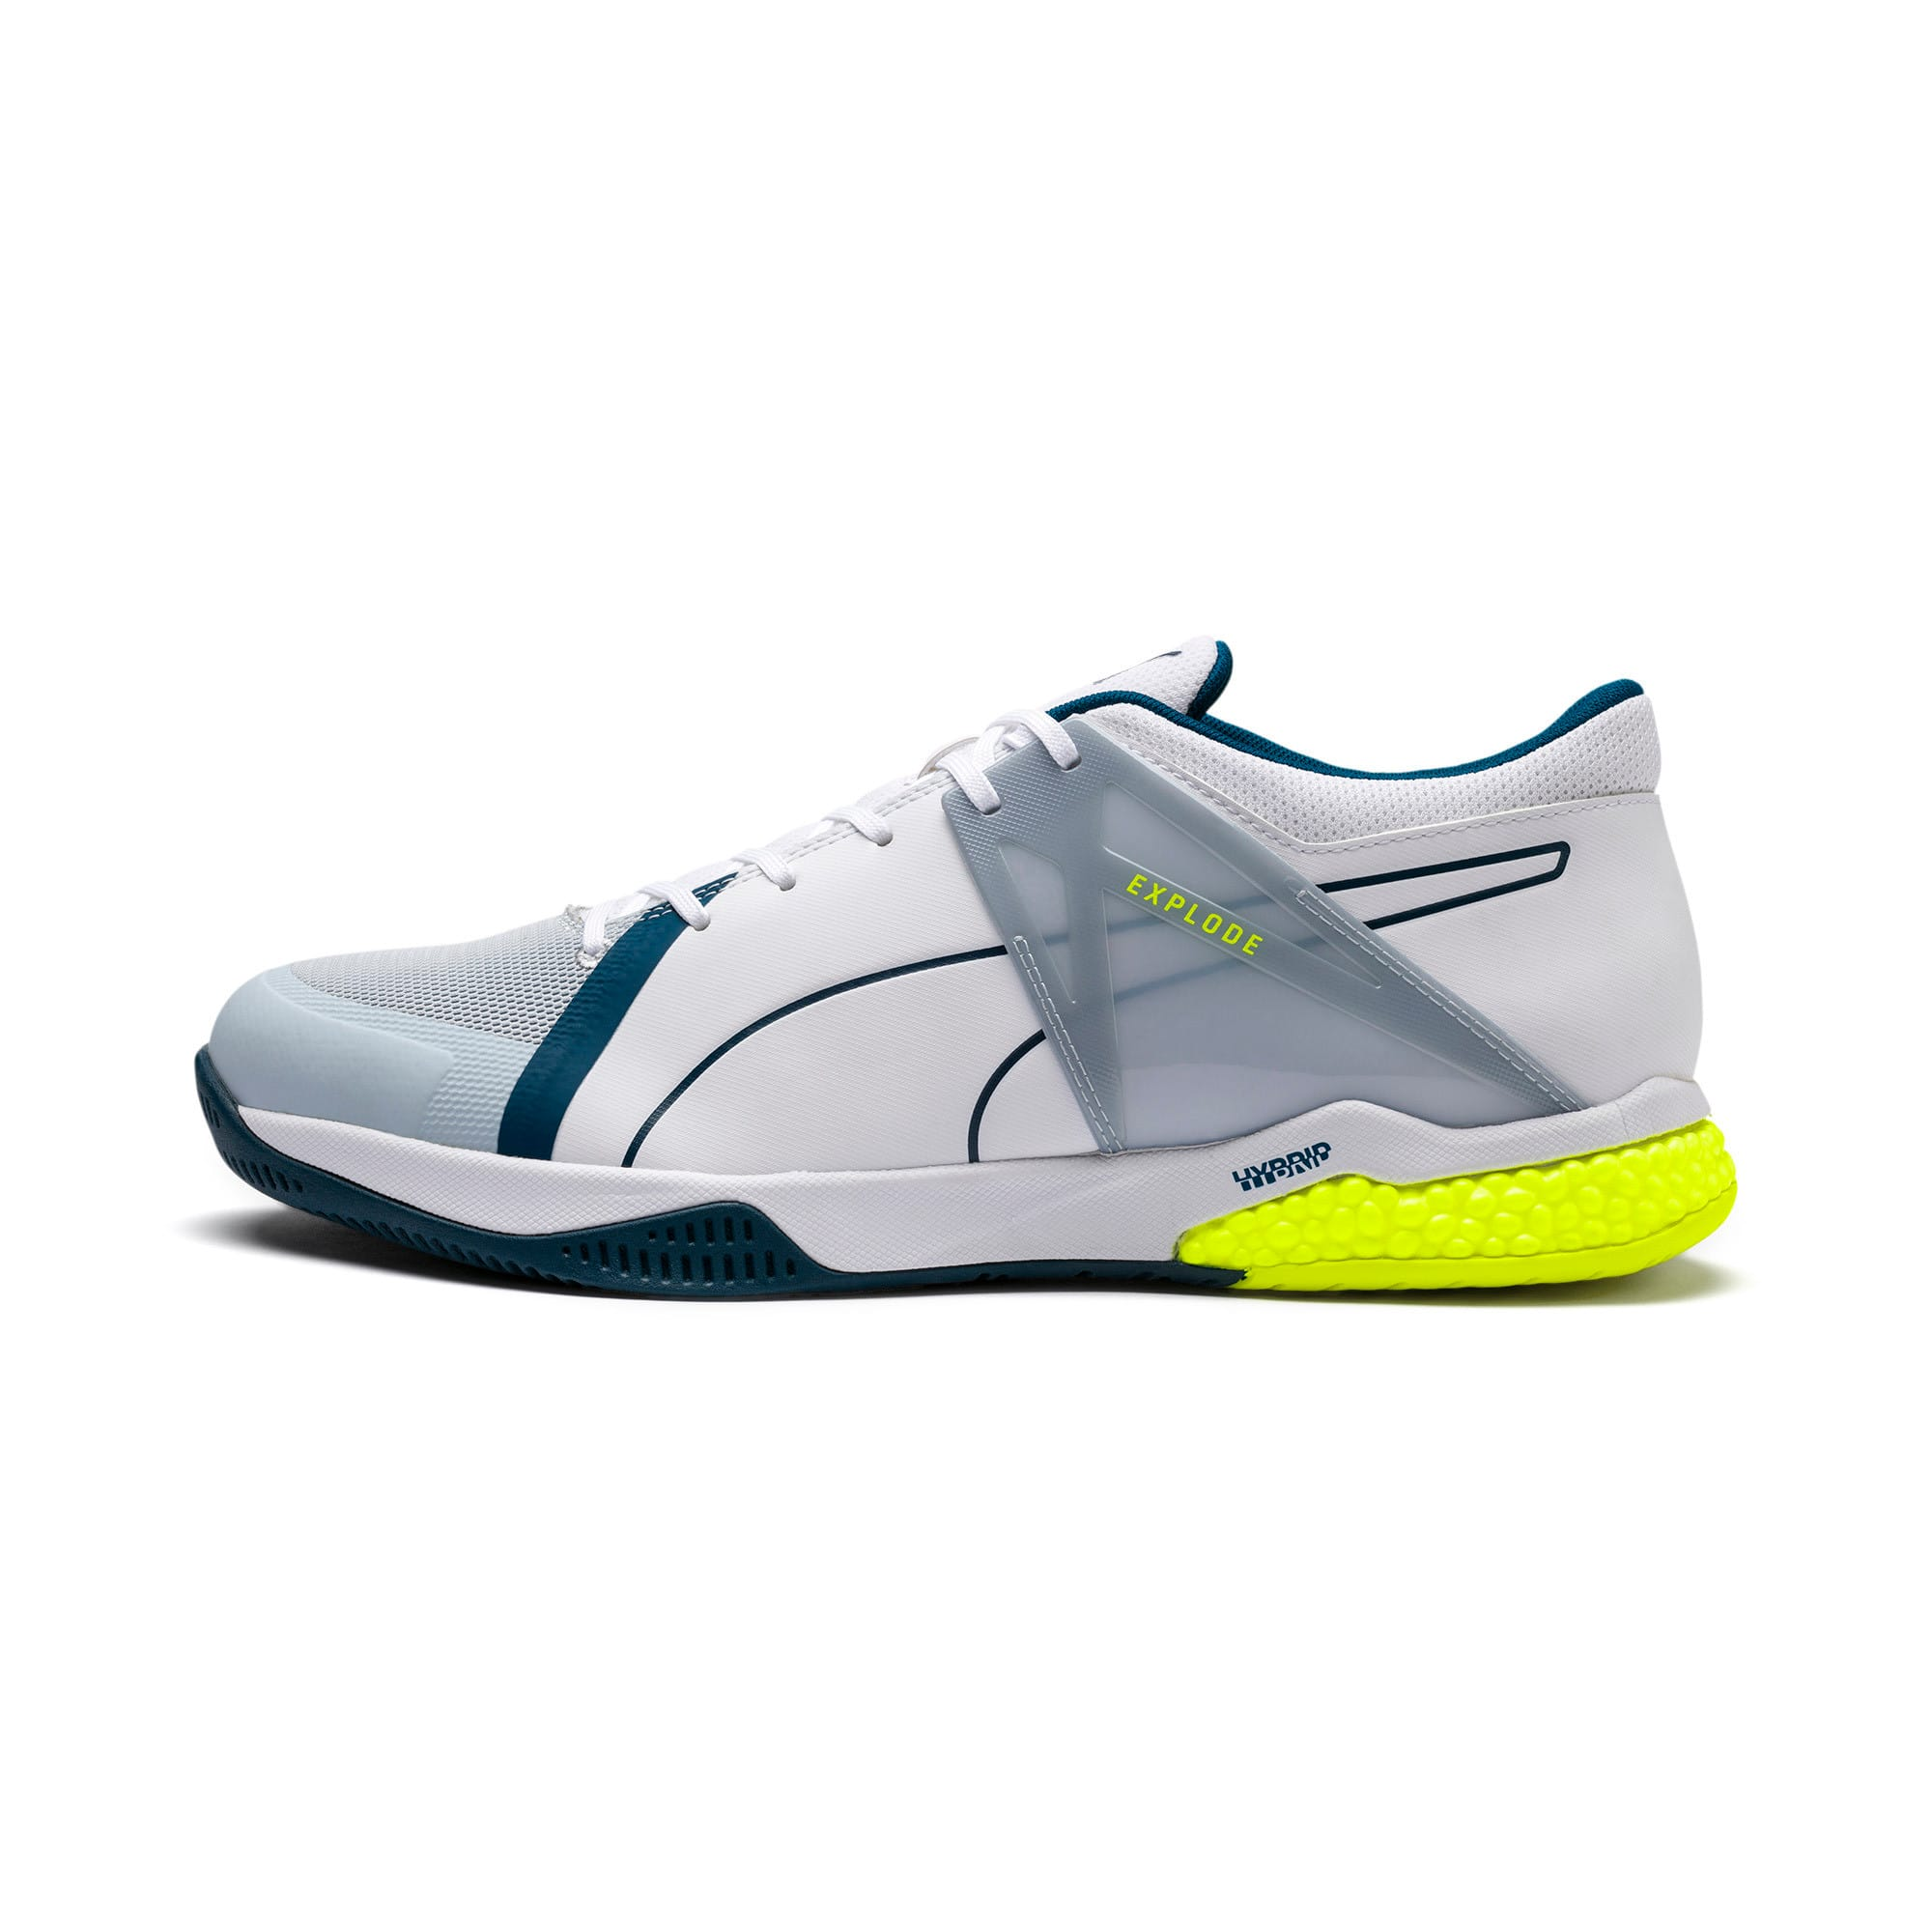 Thumbnail 1 of Explode XT Hybrid 2 Handball Shoes, White-Grey-Yellow-Gibraltar, medium-IND